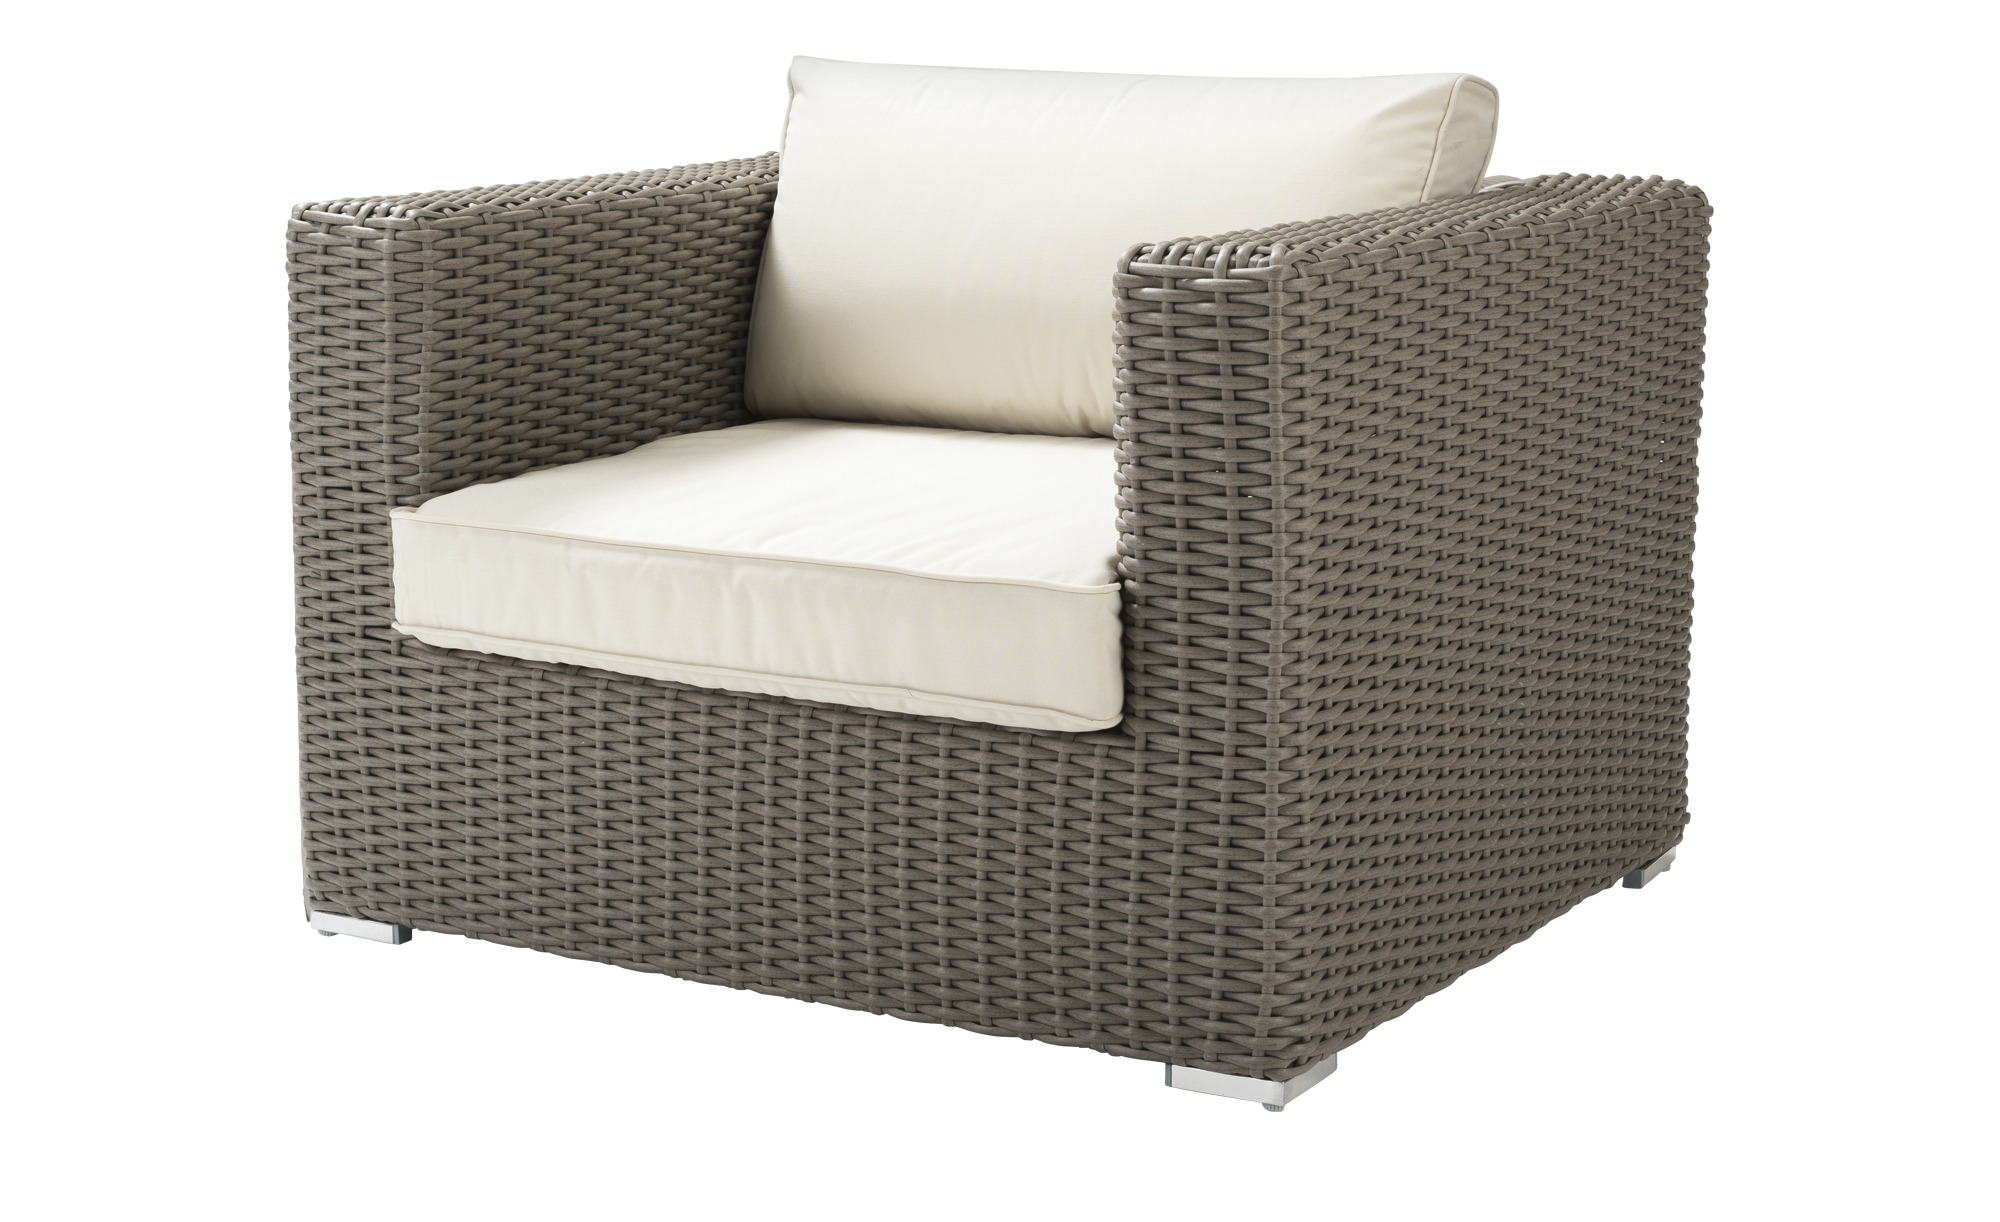 A Casa Mia Polyrattan Sessel Ibiza Bei Möbel Kraft Online Kaufen